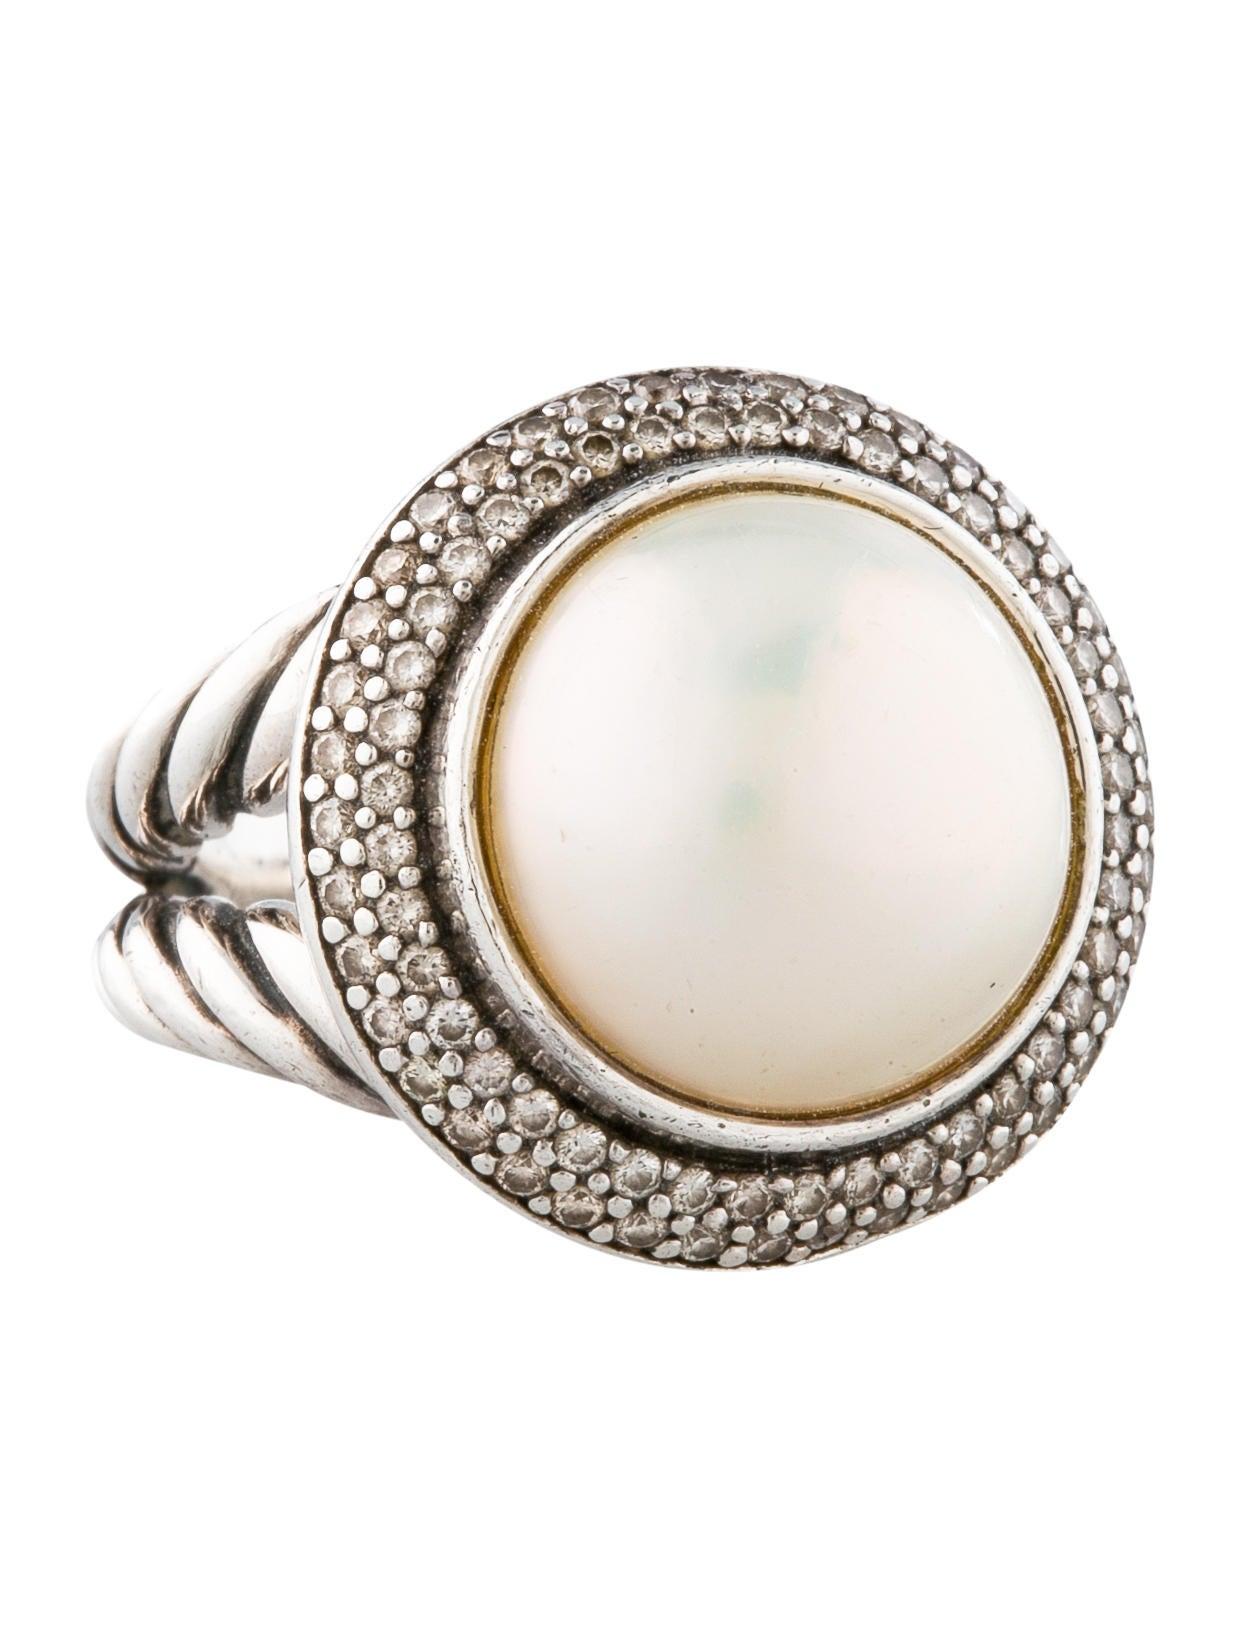 david yurman pearl and diamond cerise ring rings. Black Bedroom Furniture Sets. Home Design Ideas